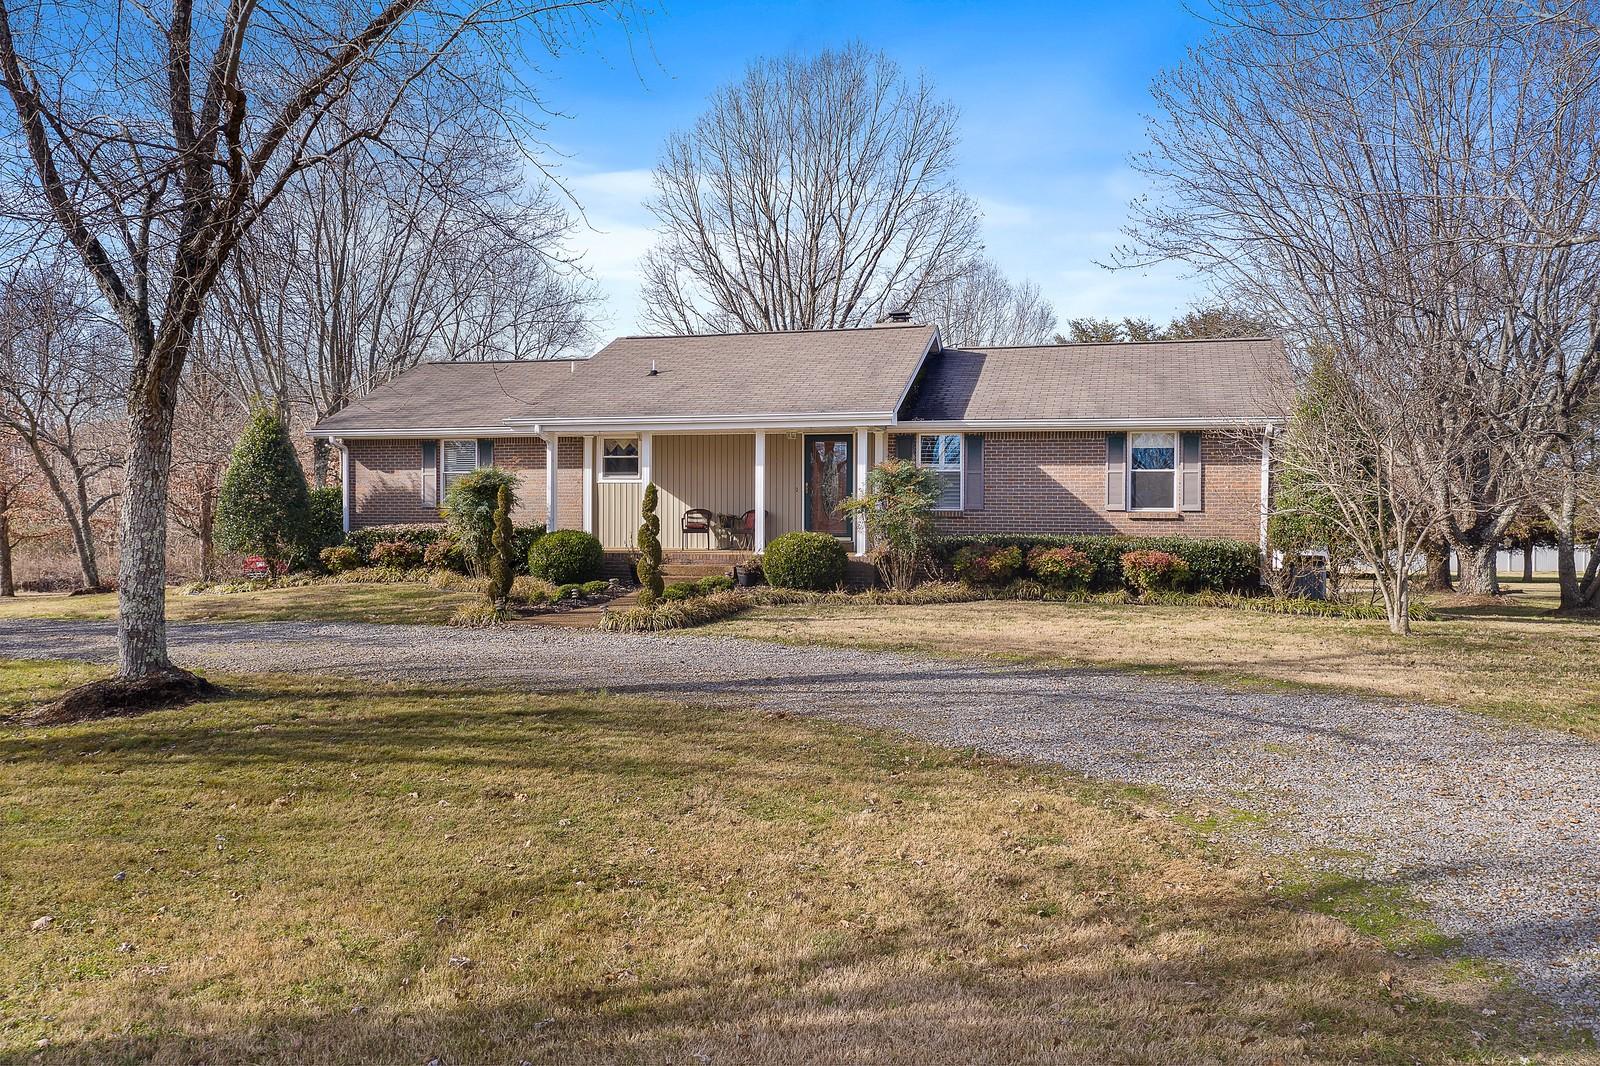 826 Shun Pike, Cottontown, TN 37048 - Cottontown, TN real estate listing